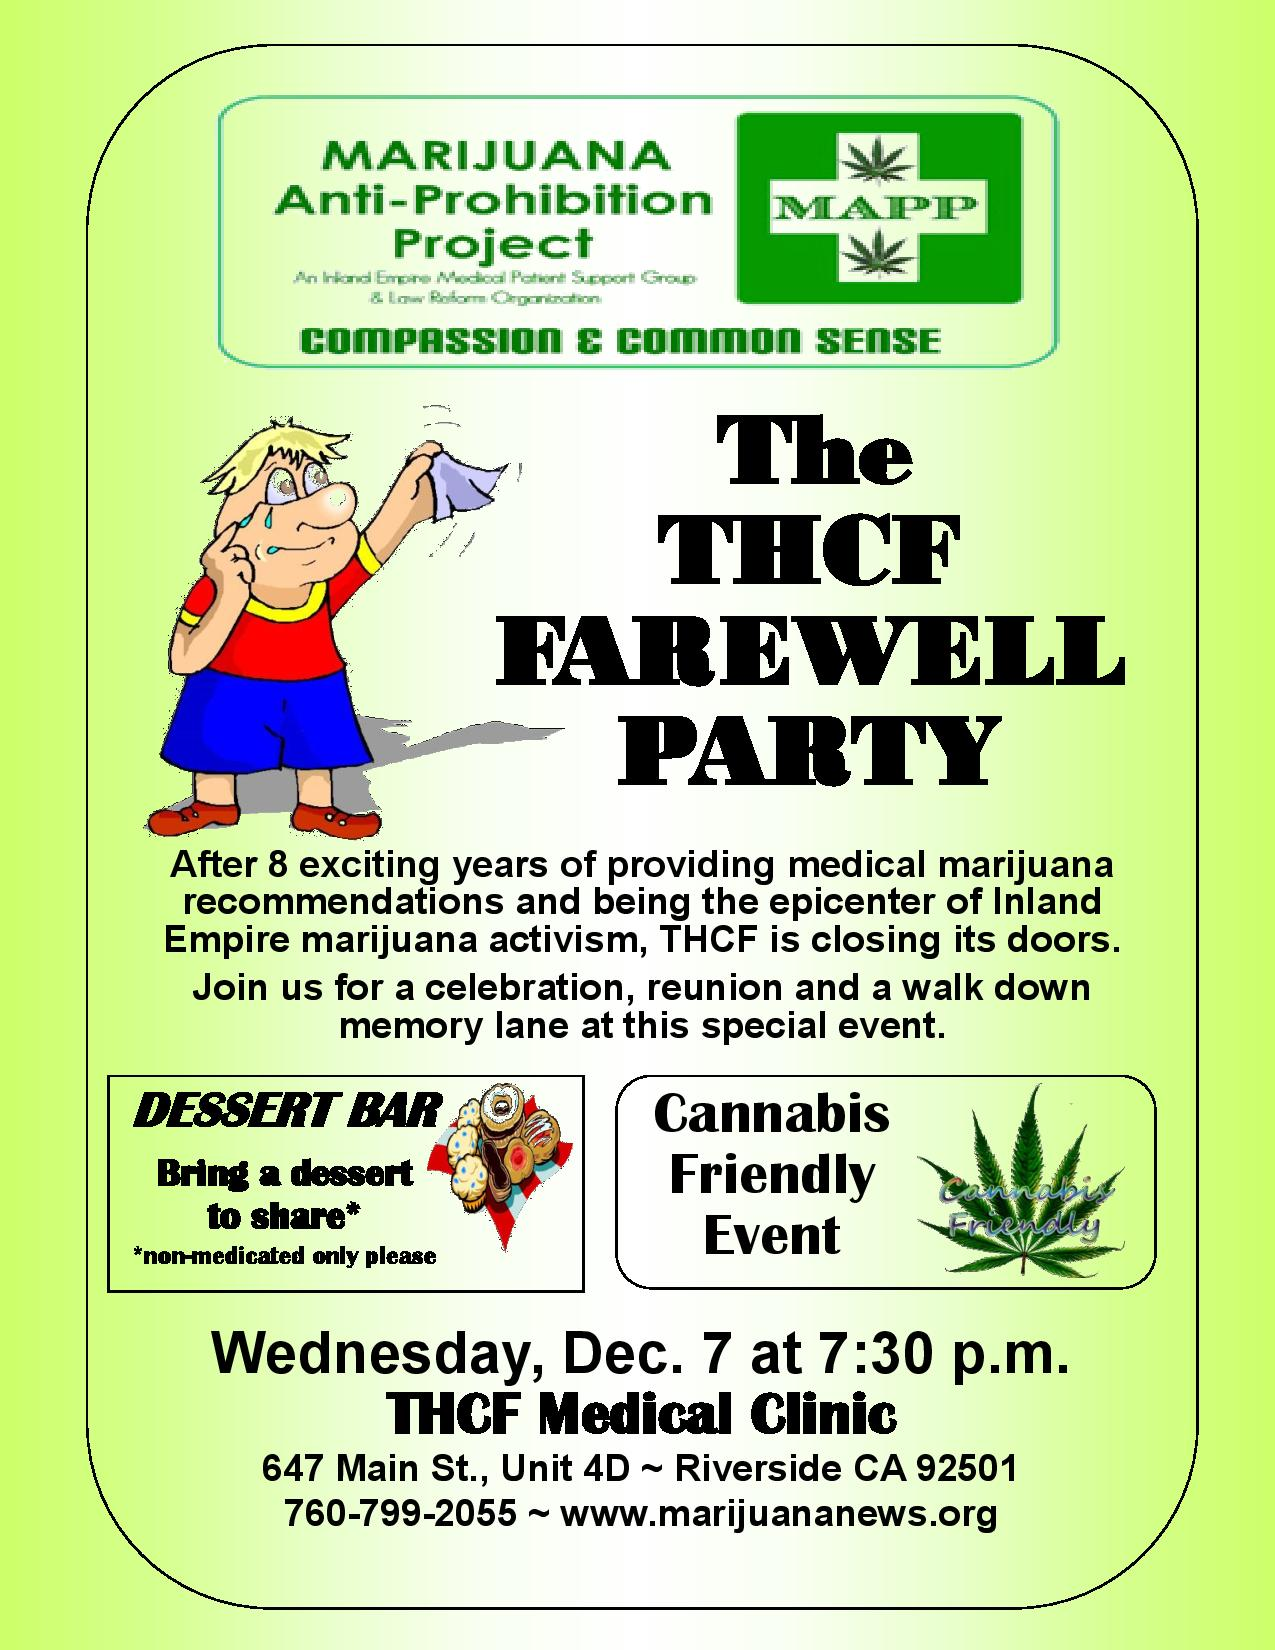 THCF_Farewell_Party.jpg